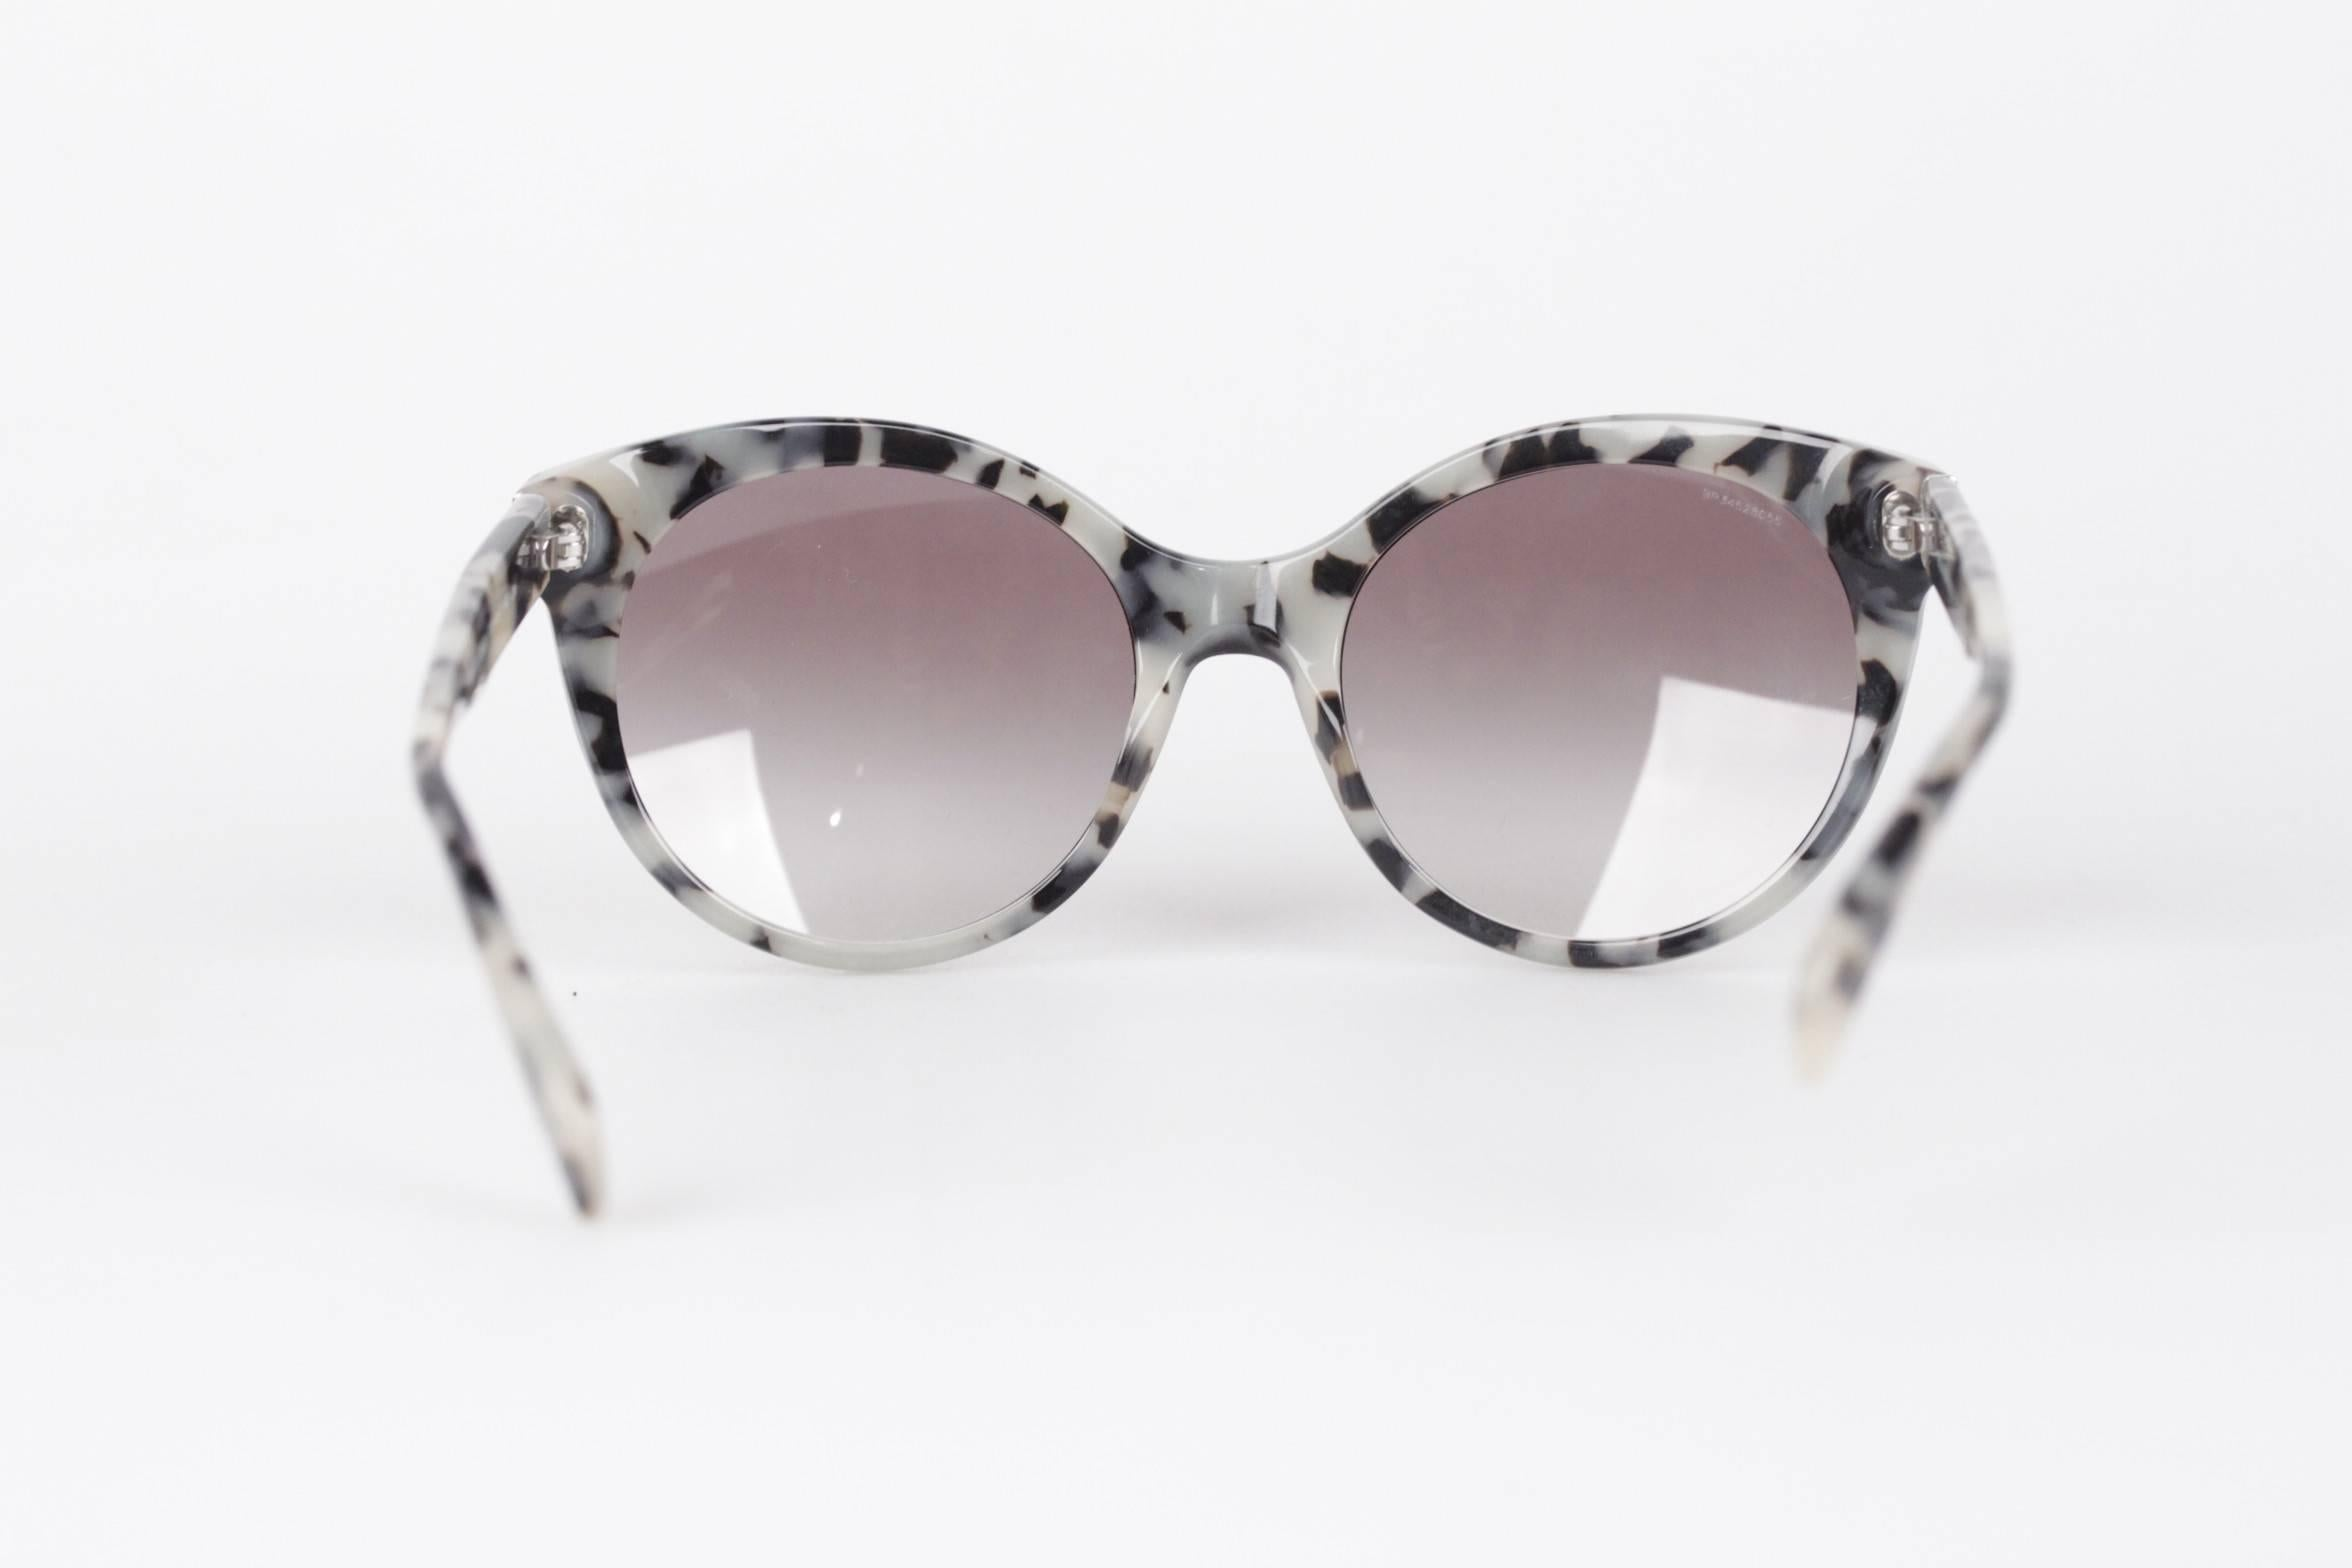 d69fea4f8b PRADA Sunglasses SPR 230 56 20 140 2N ANIMALIER pattern w CASE and BOX at  1stdibs